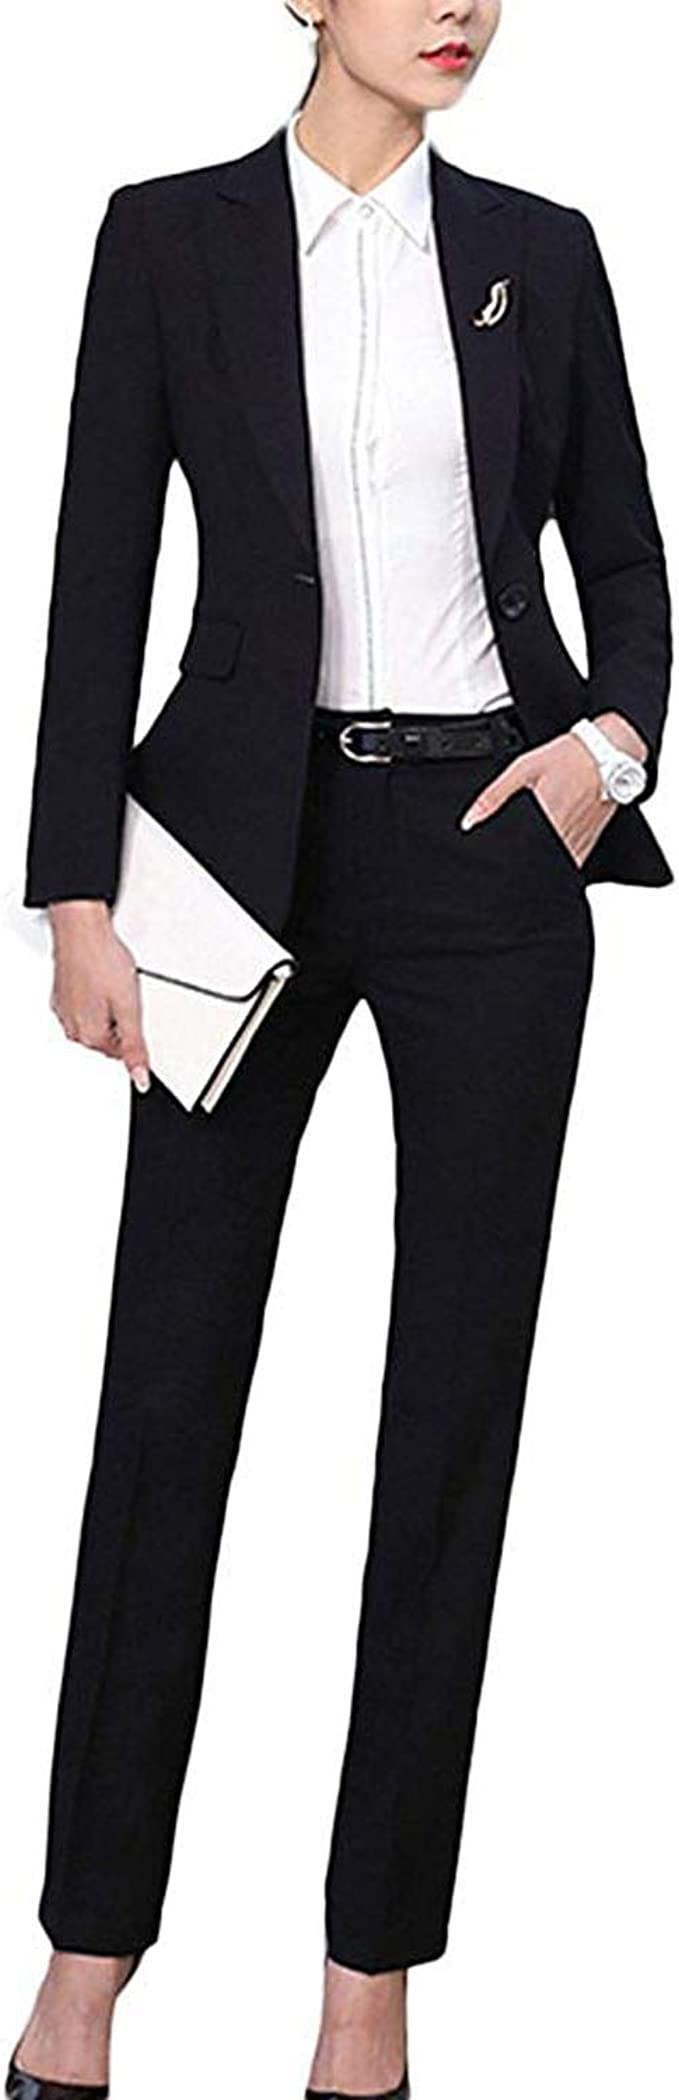 YSMO Damen Slim 2 Stück Blazer Hose Jackst Anzüge Set